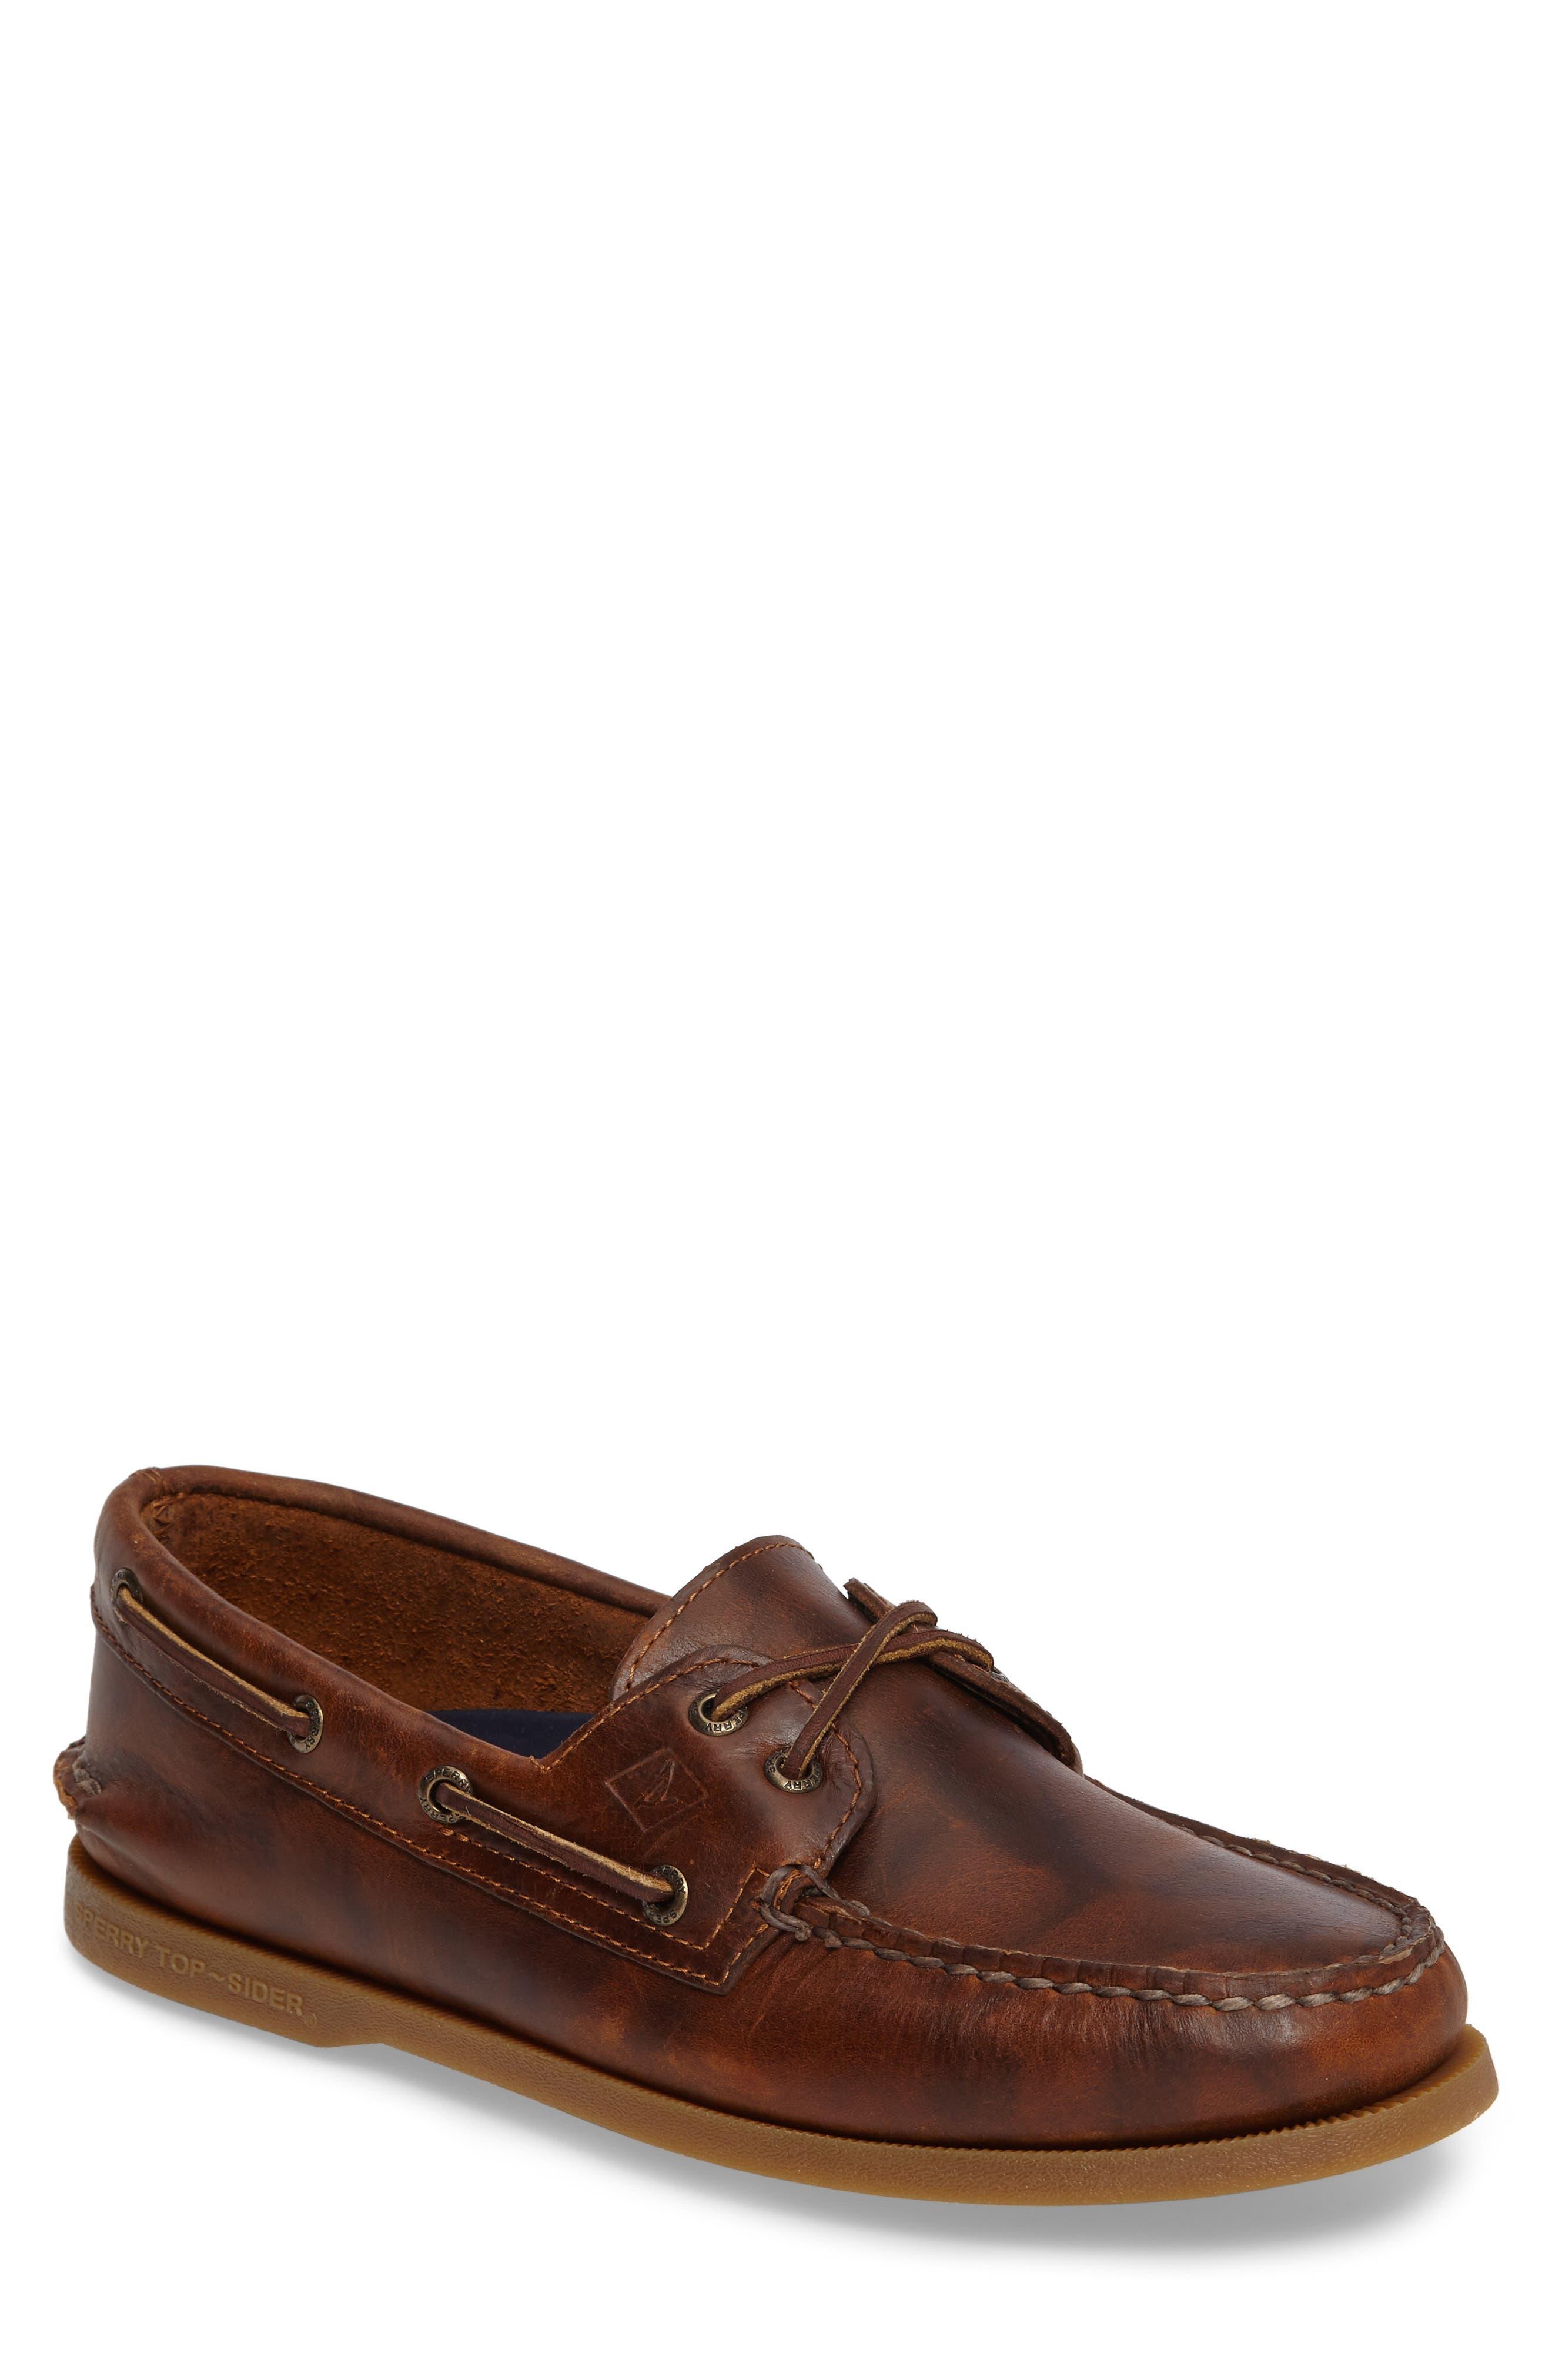 Sperry Authentic Original Boat Shoe (Men)